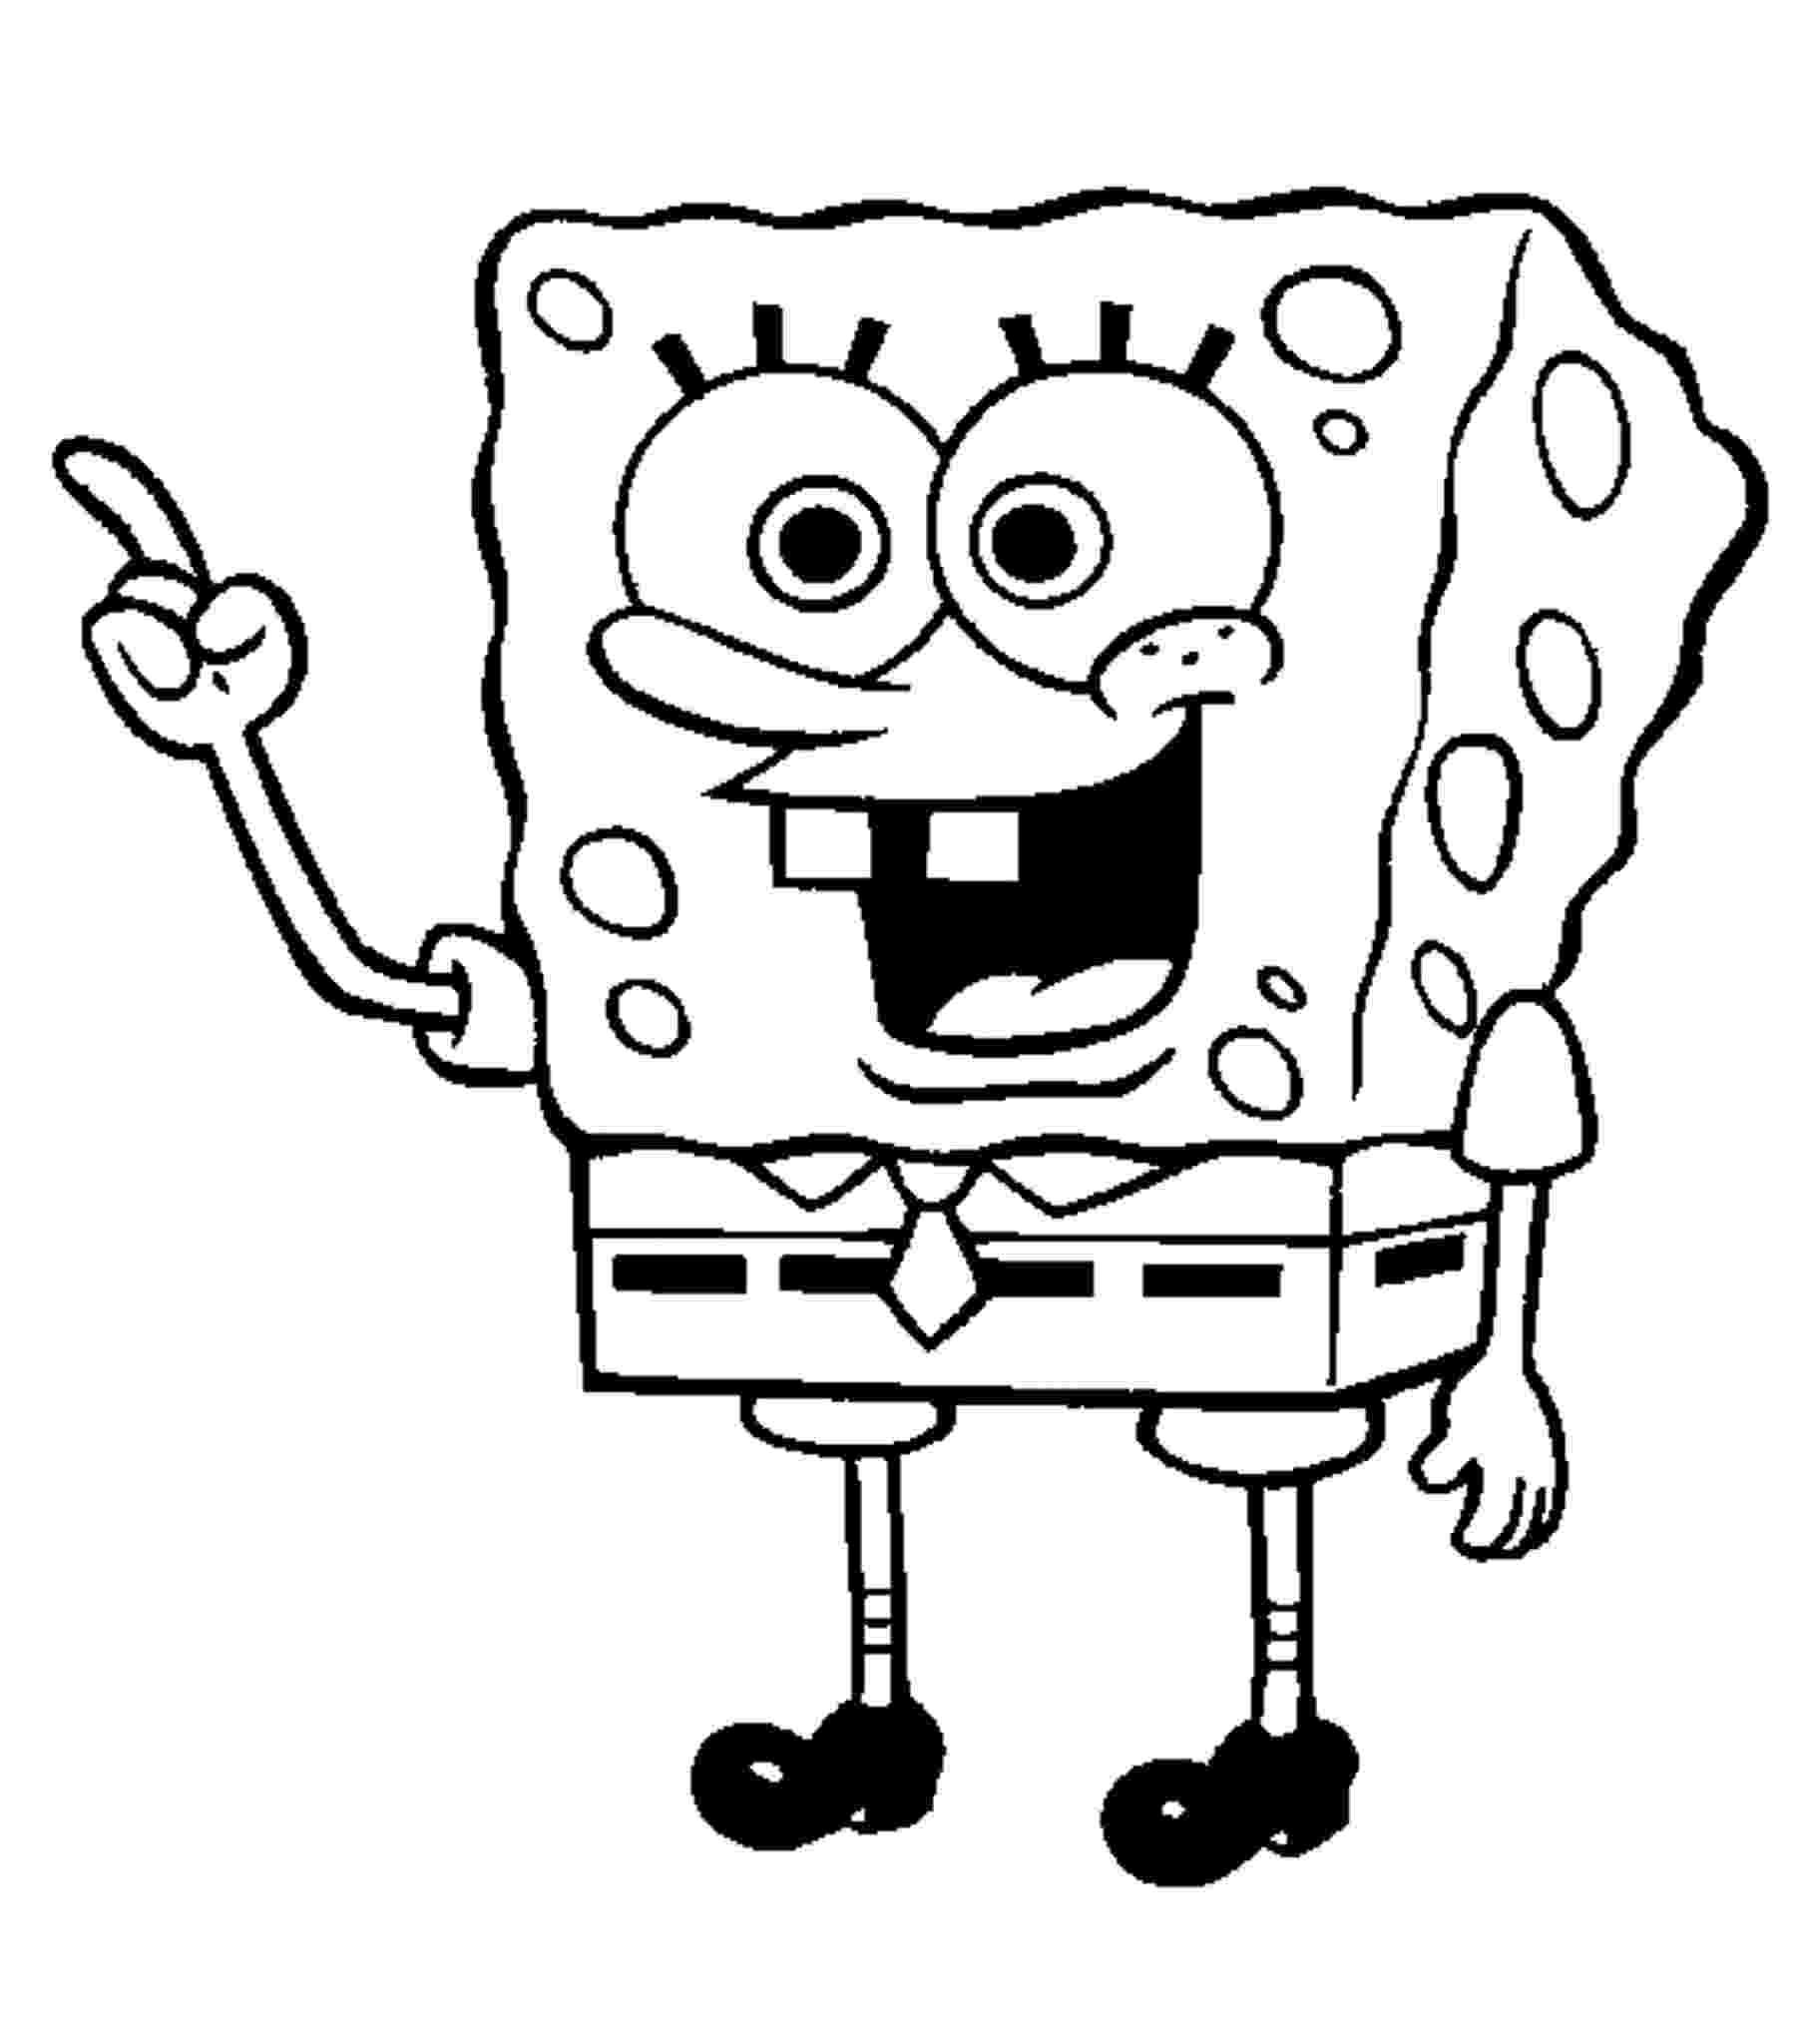 spongebob coloring sheet spongebob coloring pages sheet spongebob coloring